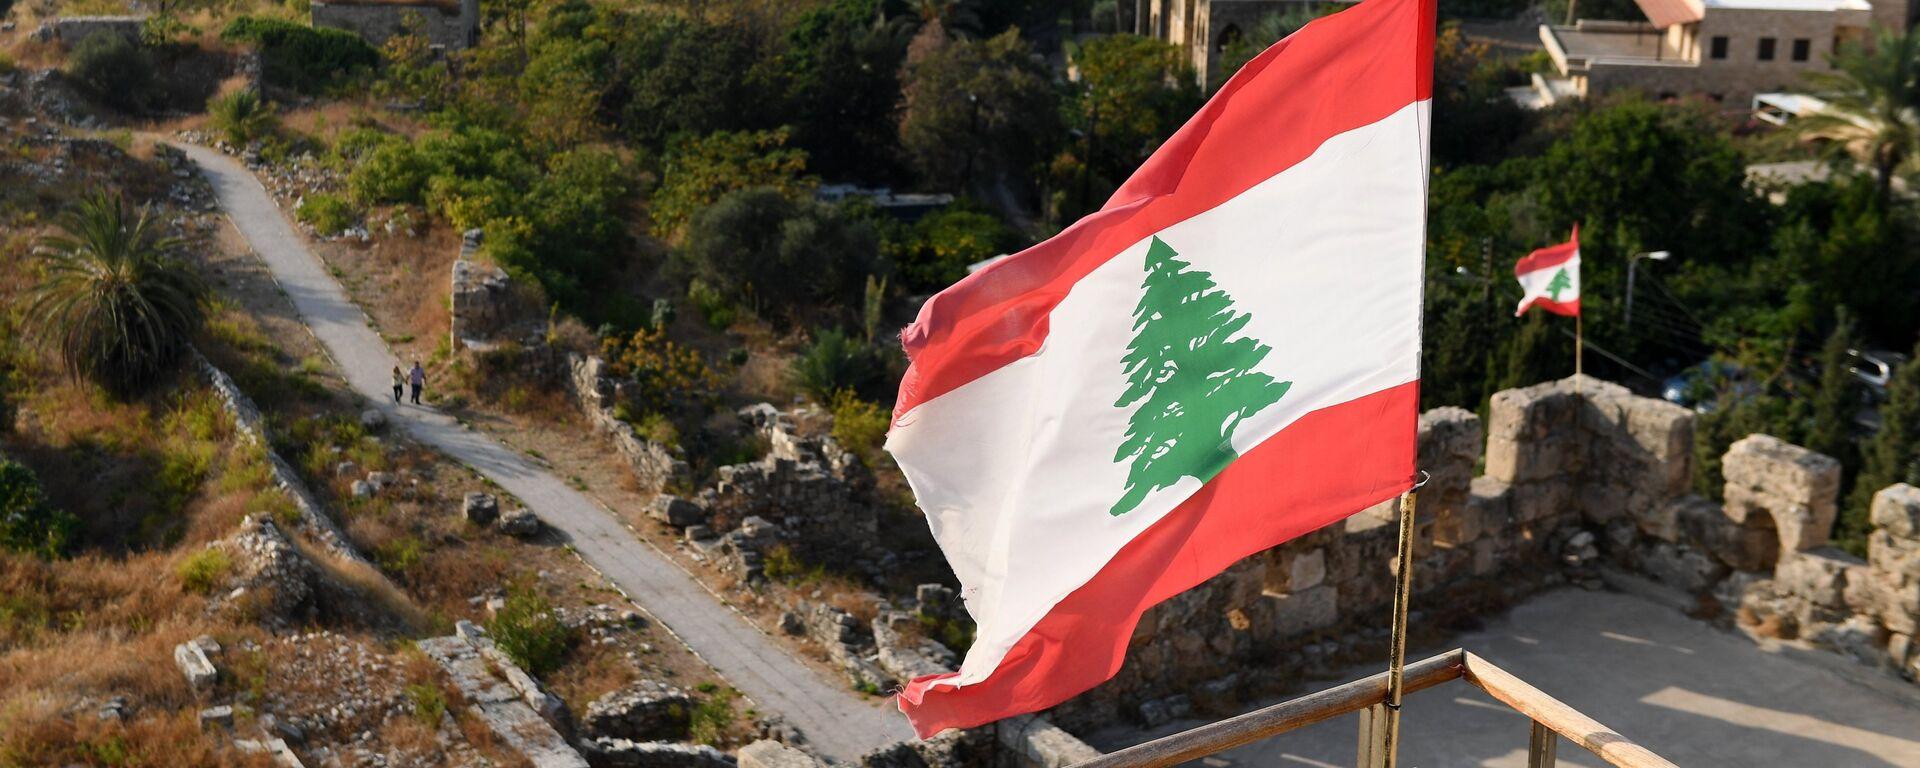 Bandera de Líbano - Sputnik Mundo, 1920, 16.07.2021